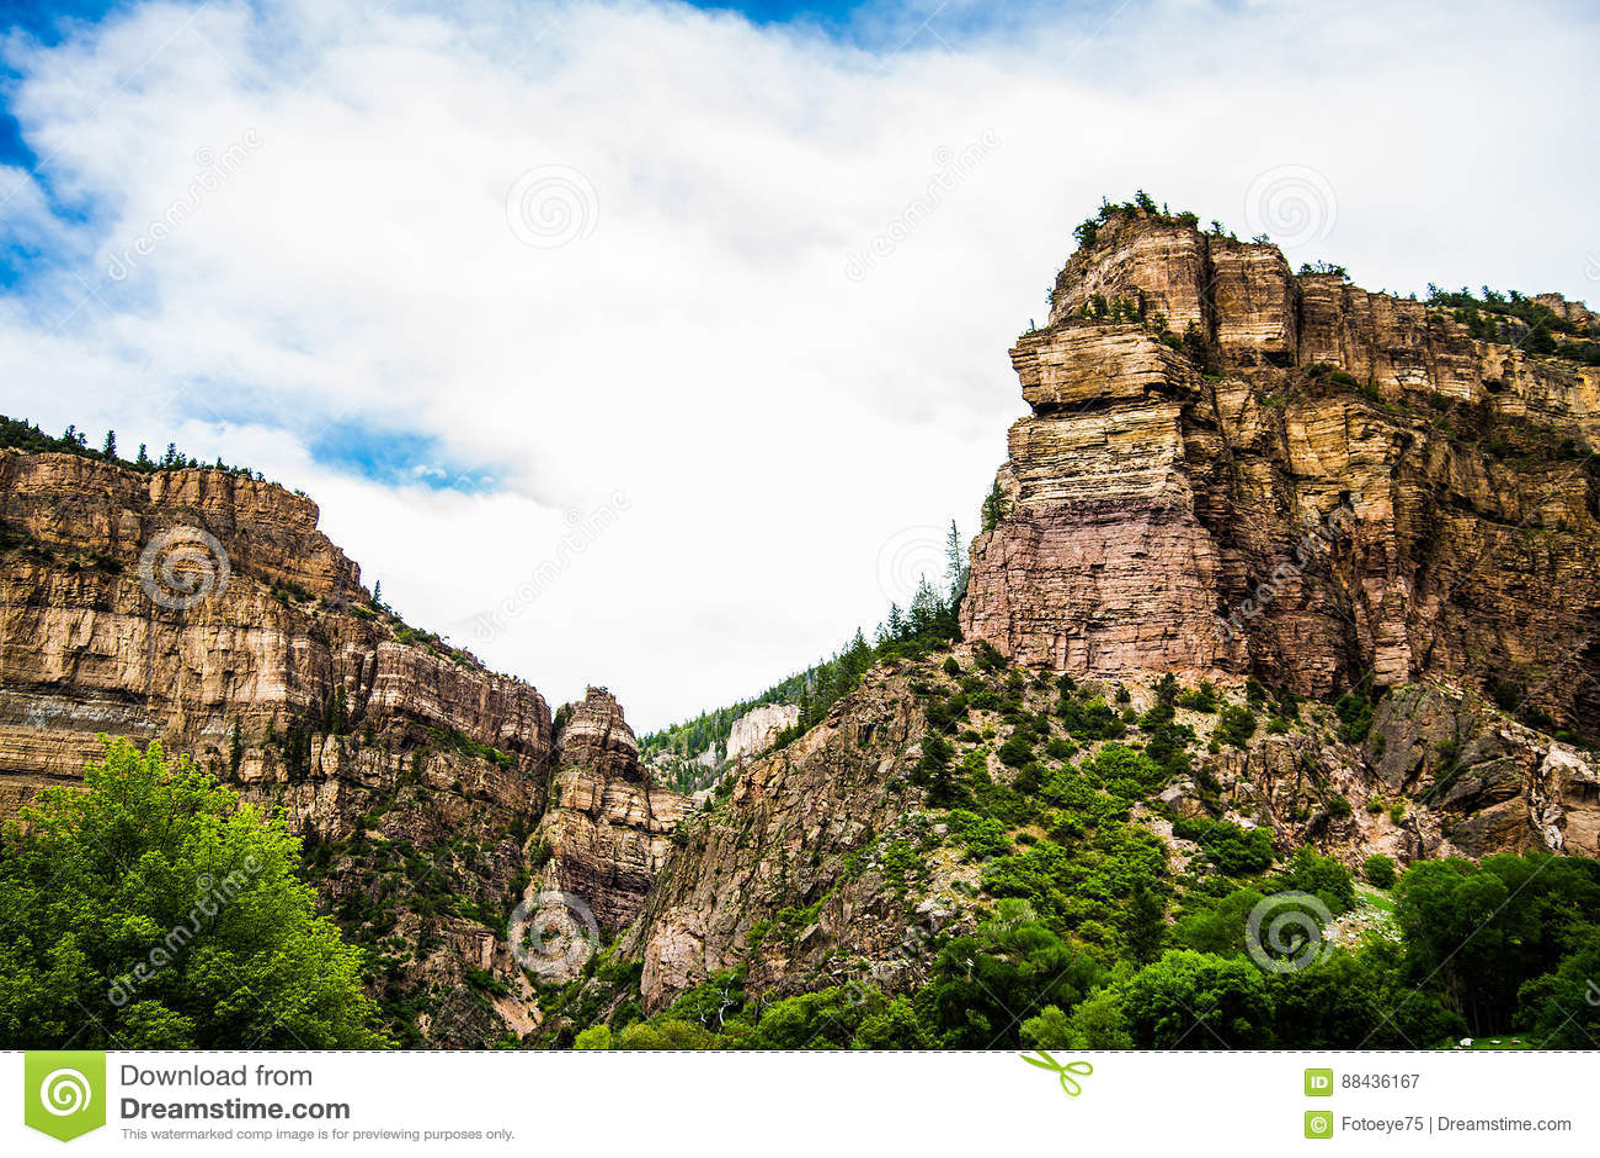 Canyon di Glenwood in Colorado